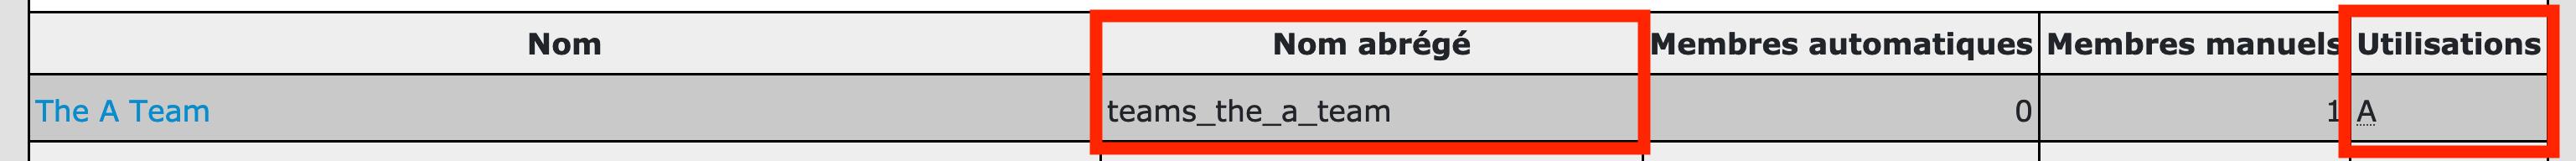 8FDmsteams_teamlink00004.png